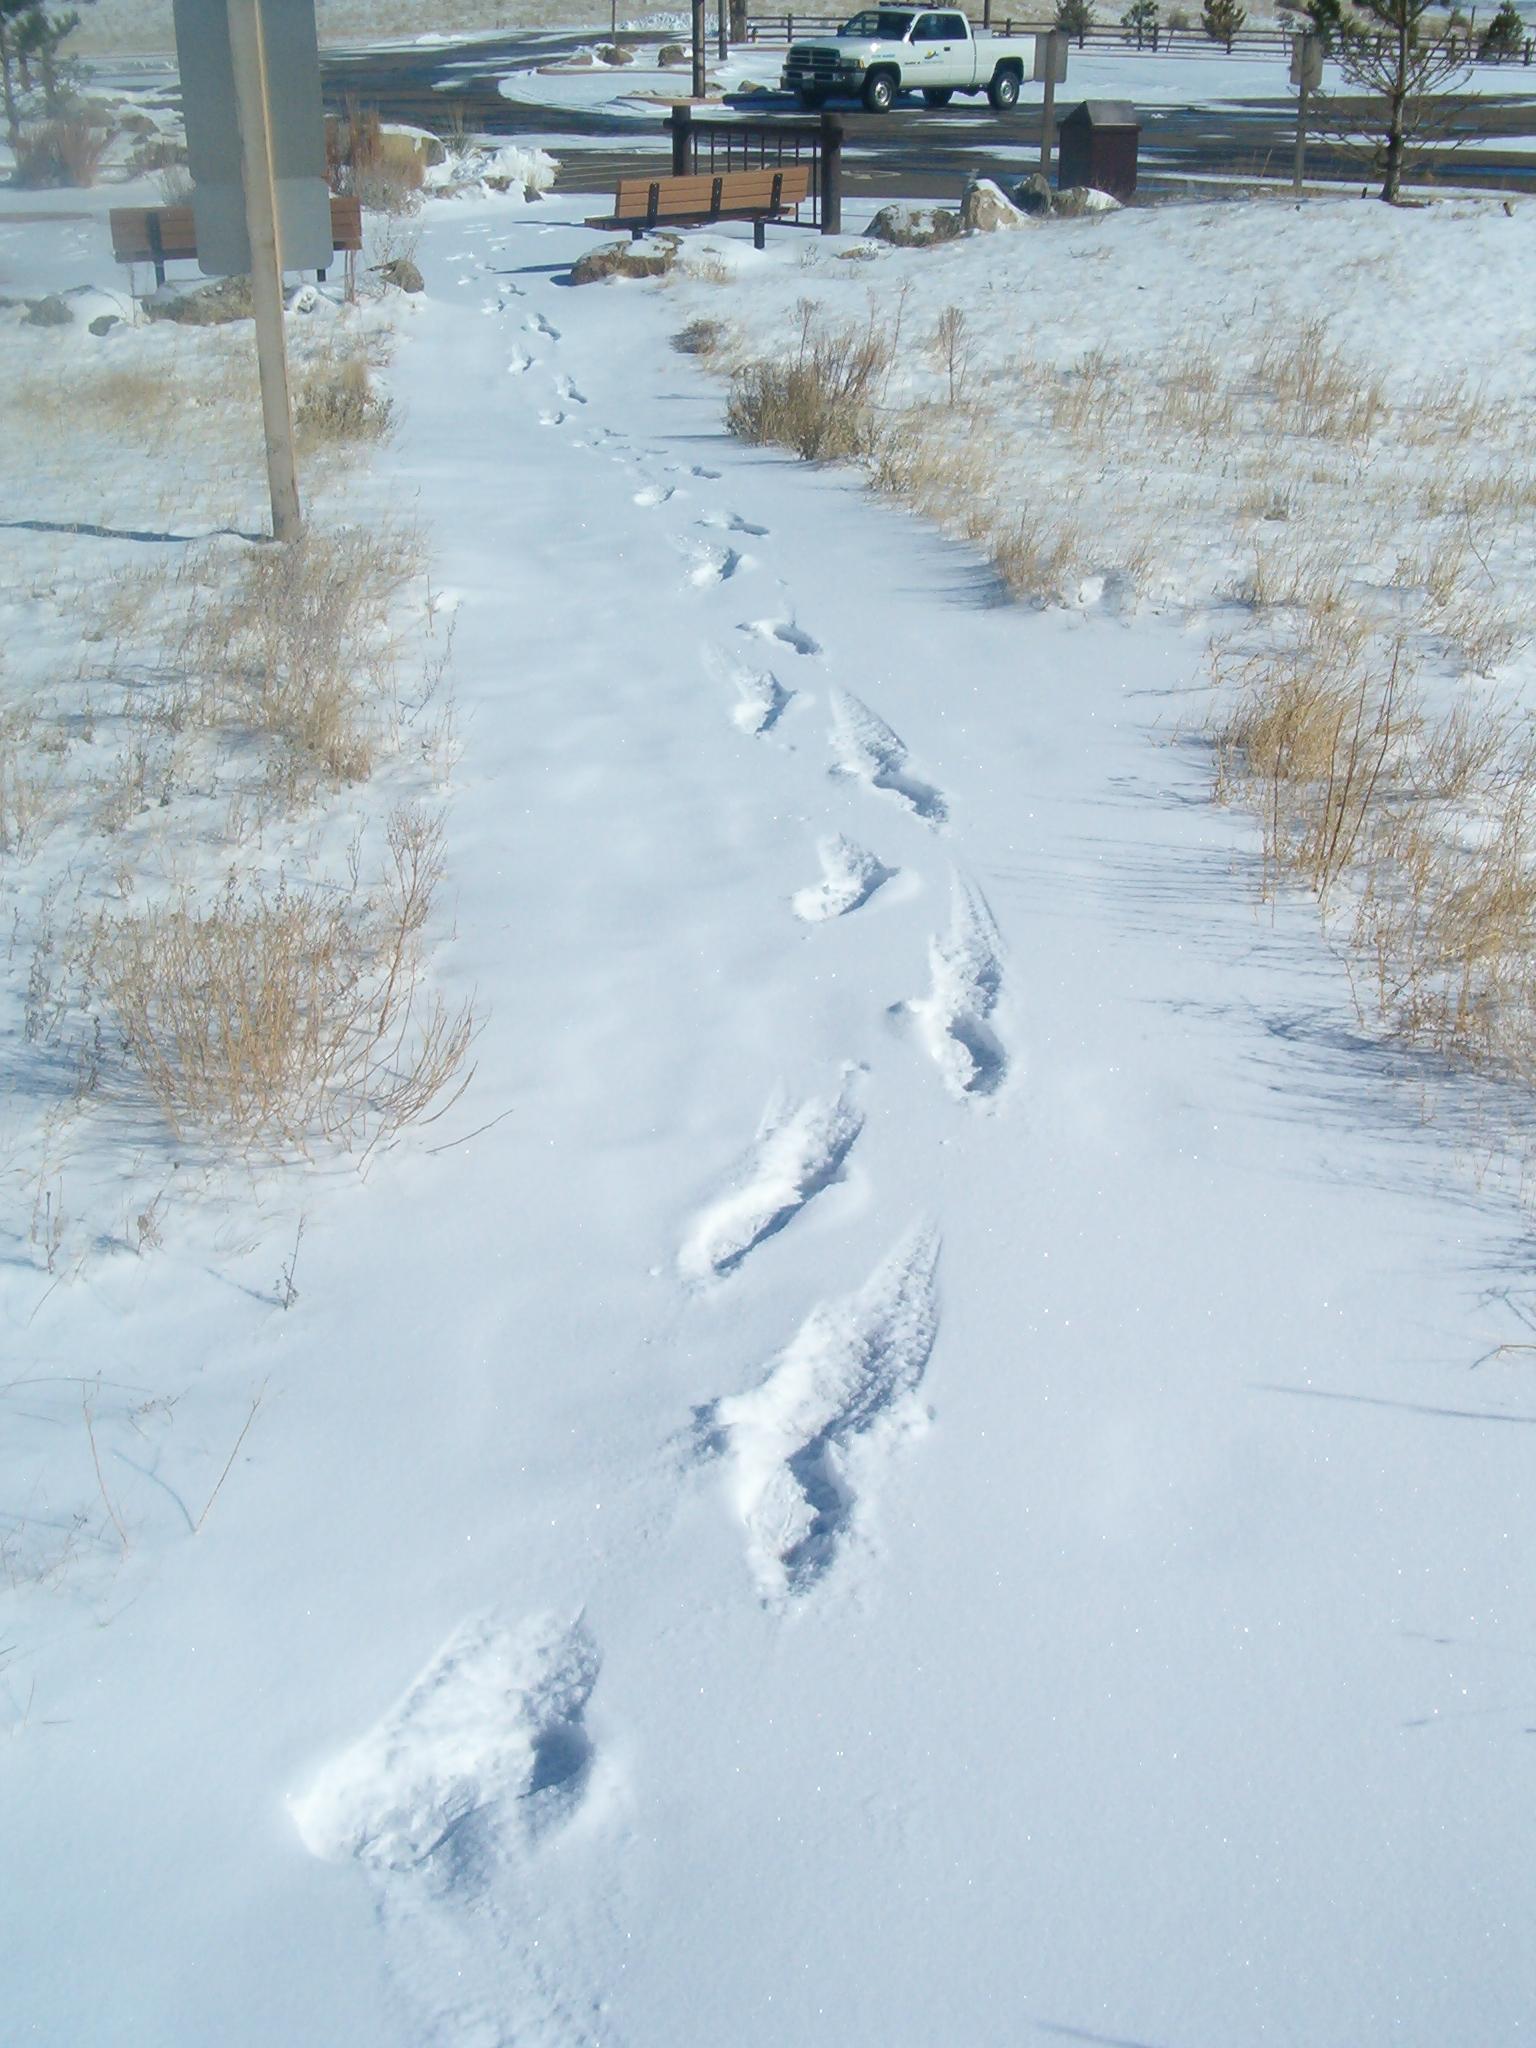 Cheyenne mountain state park bill hensleys random blog one publicscrutiny Choice Image